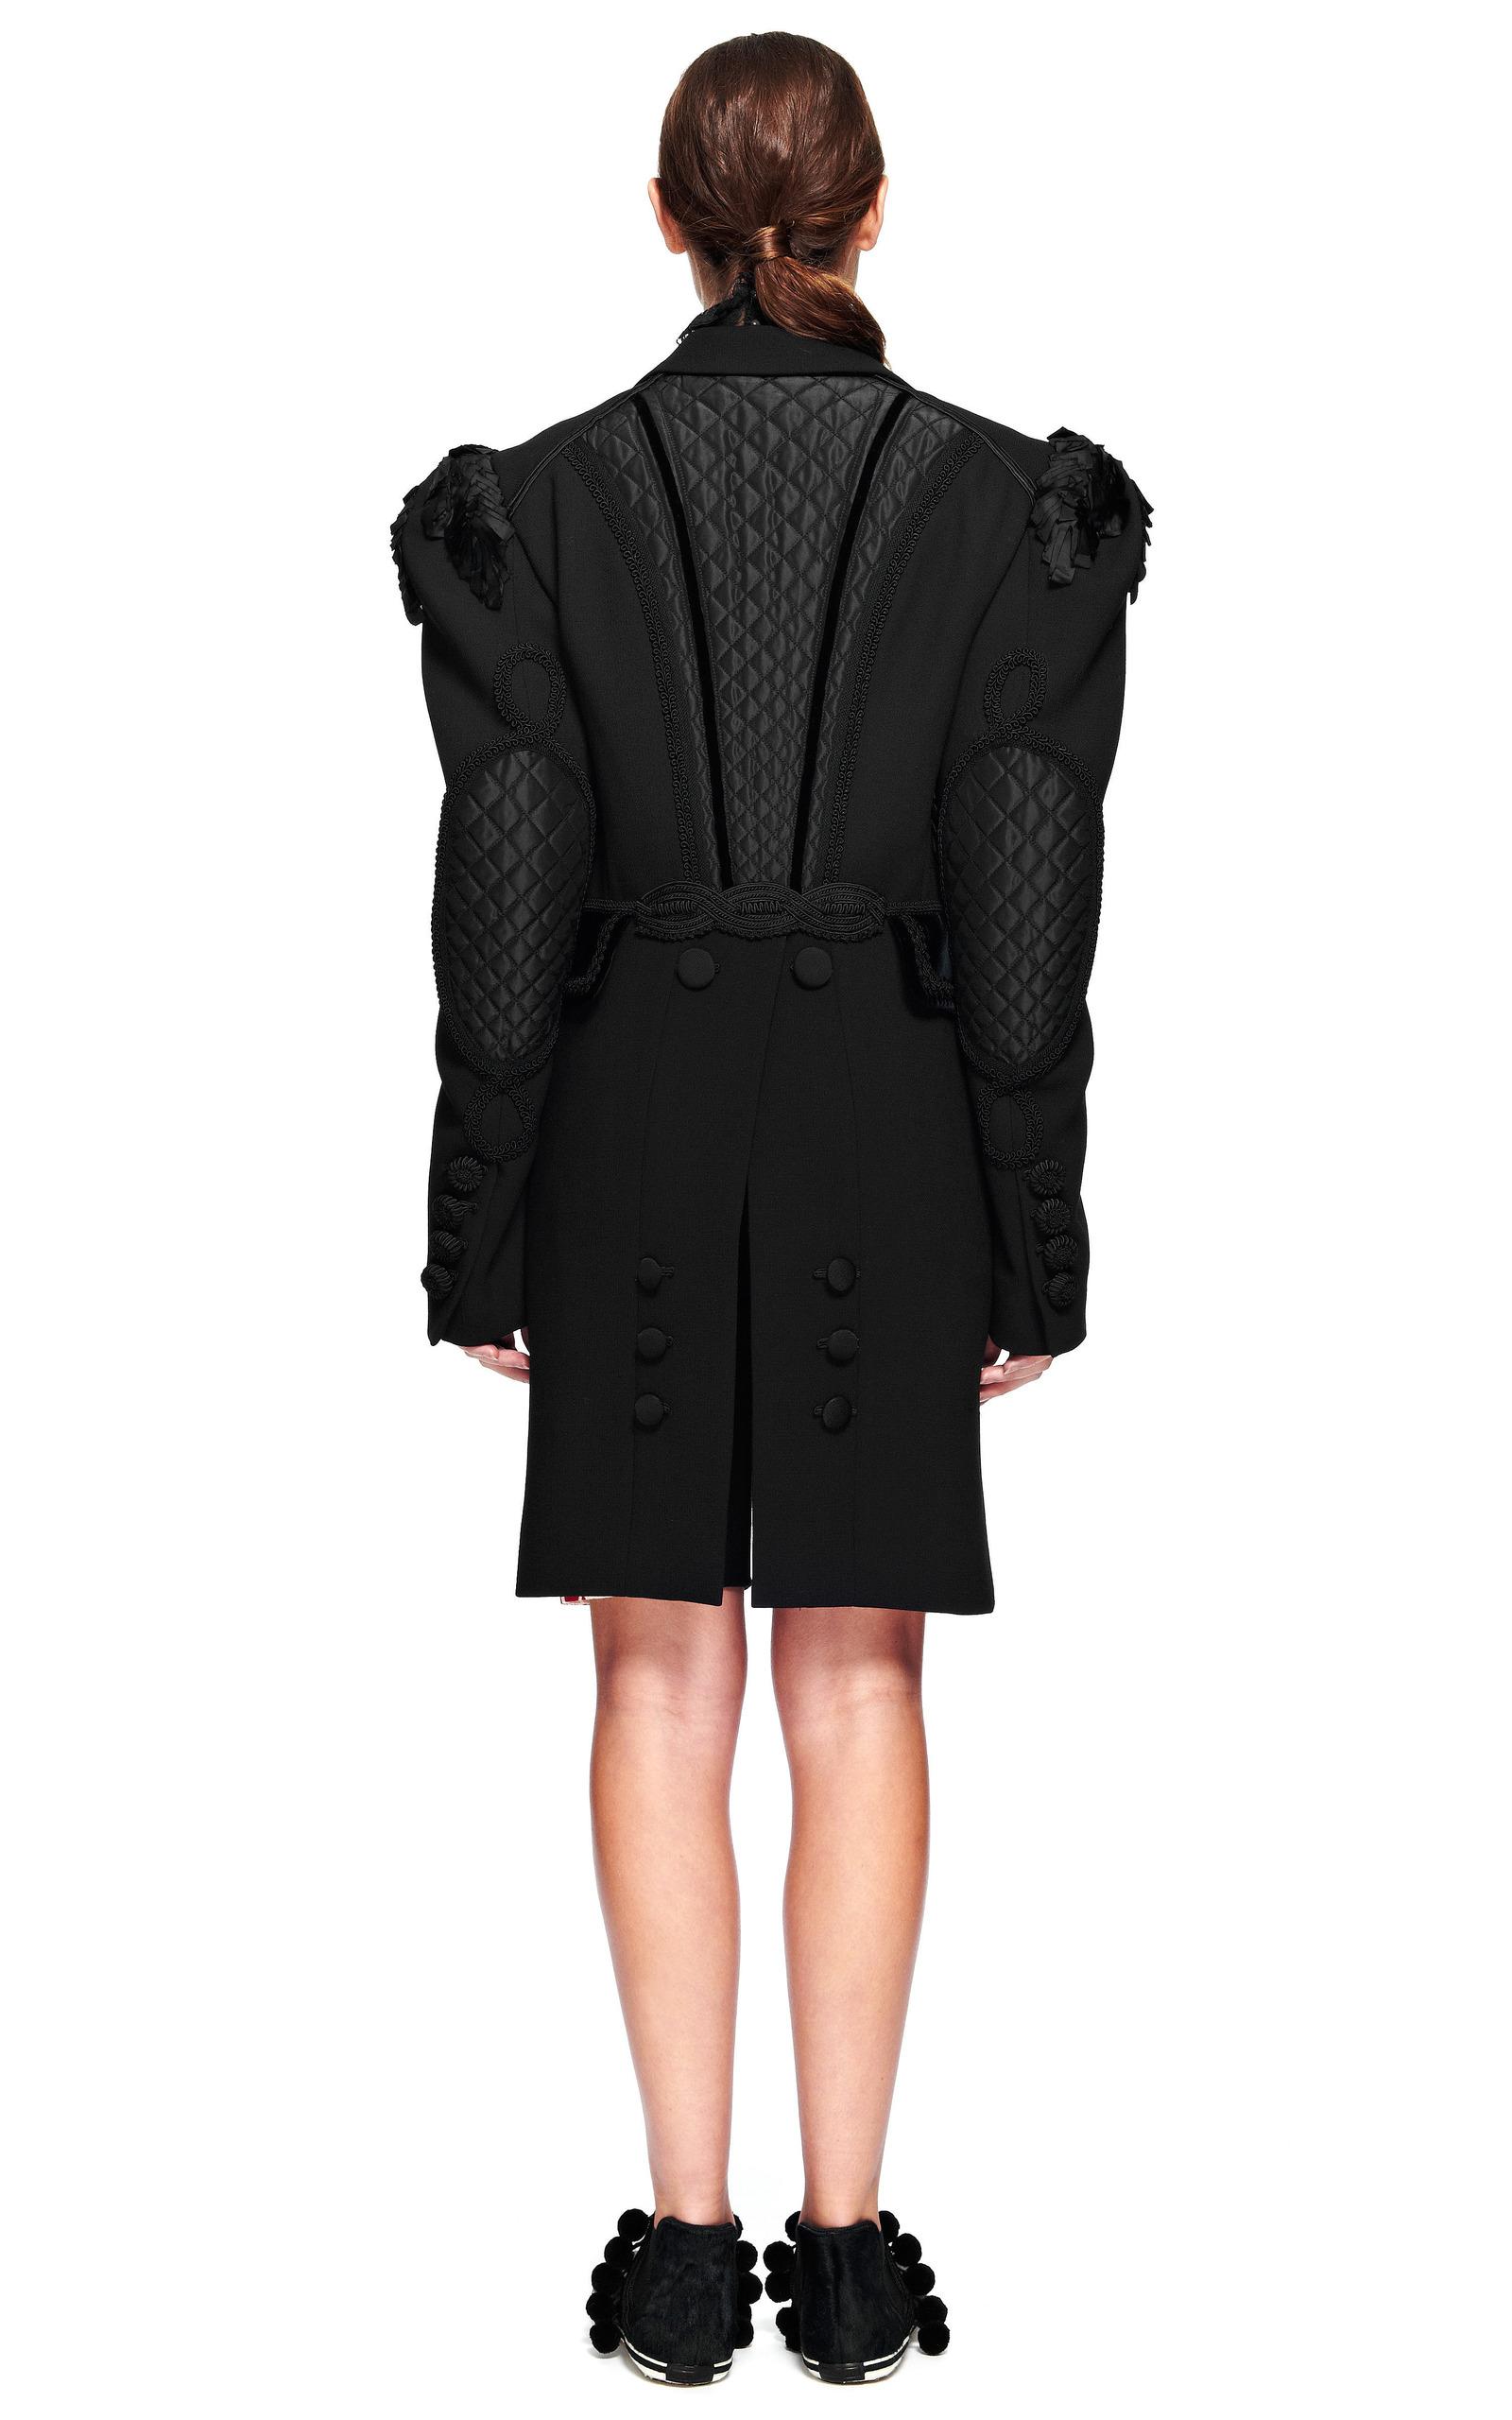 Black Lightweight Wool Coat With Tails And | Moda Operandi